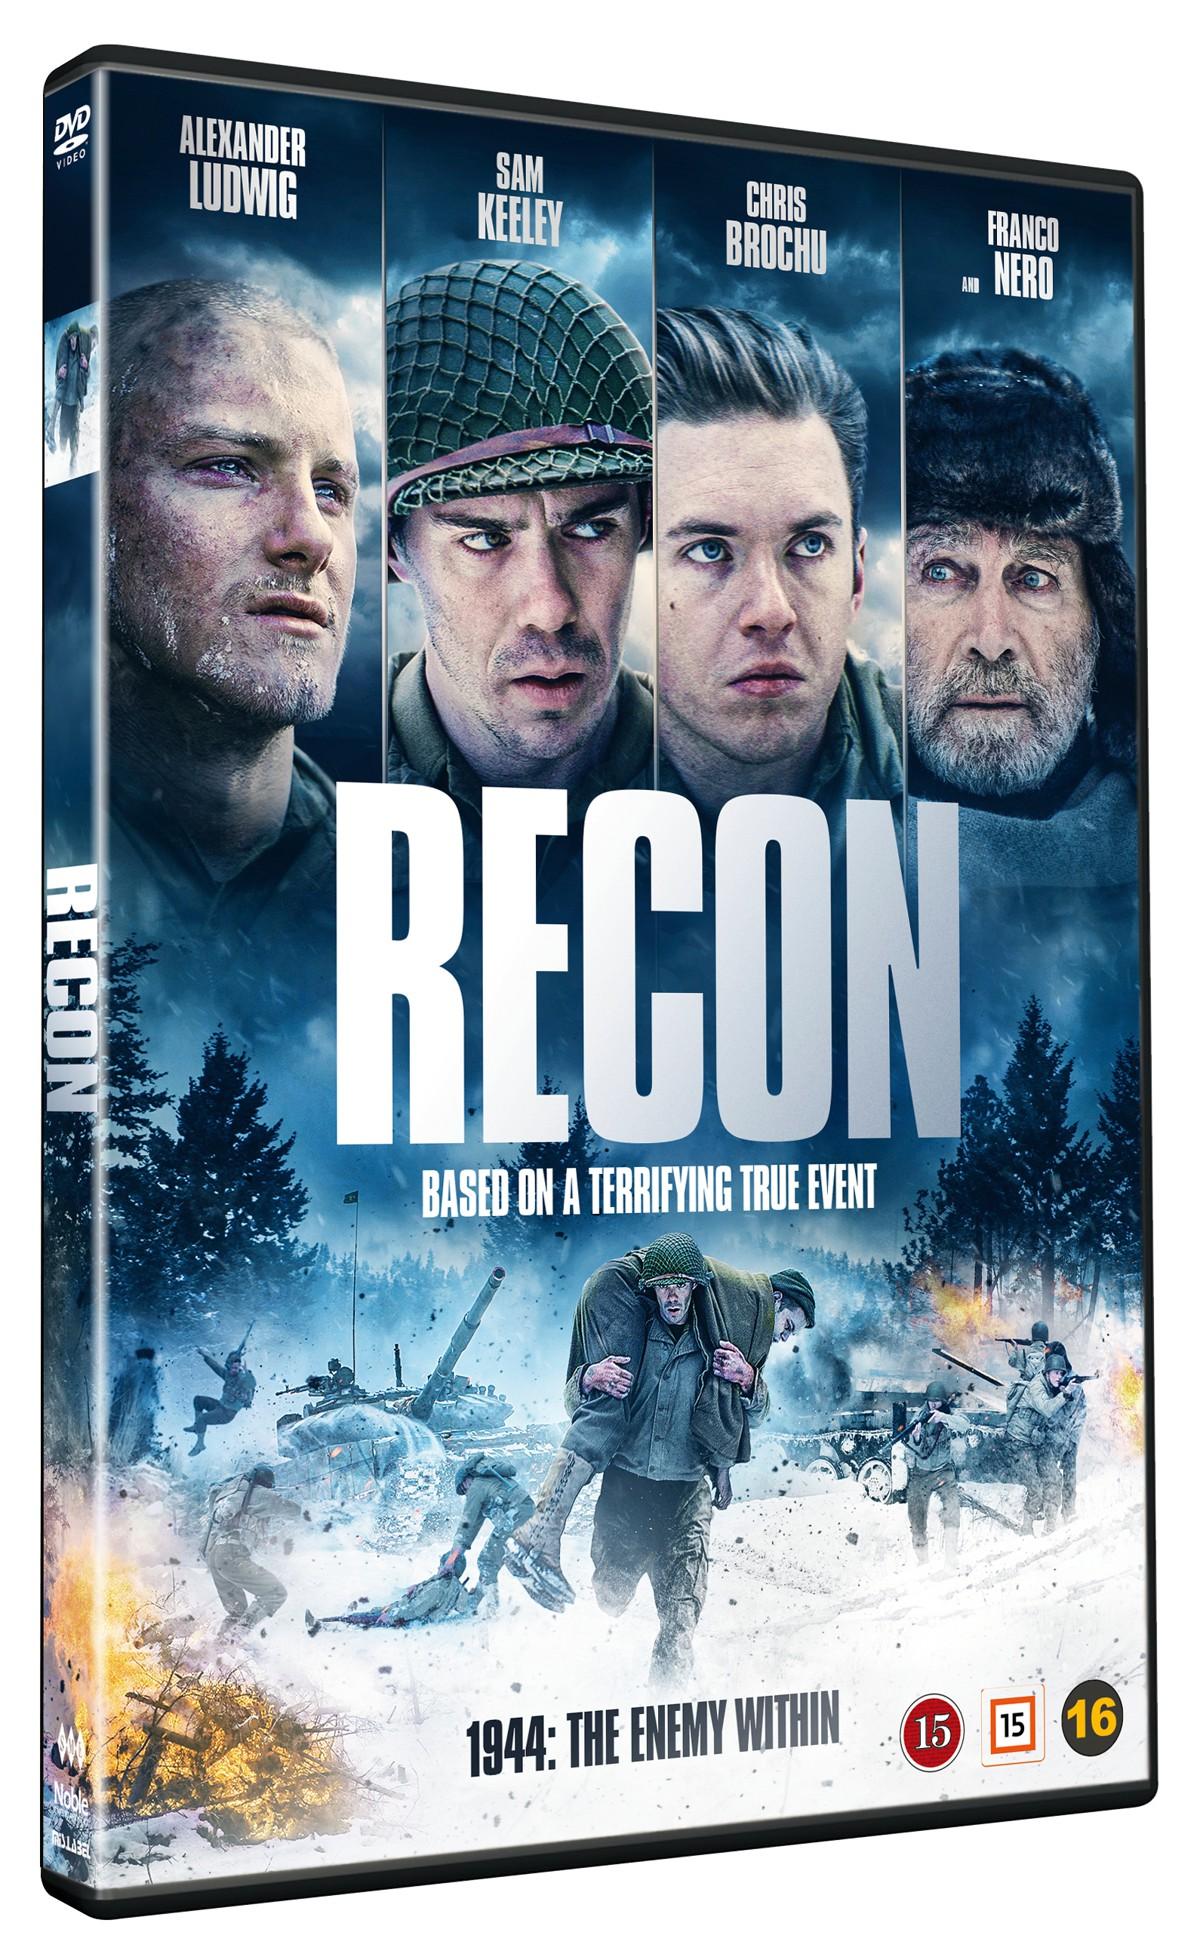 Recon - Alexander Ludwig - Film -  - 5705535066662 - September 13, 2021